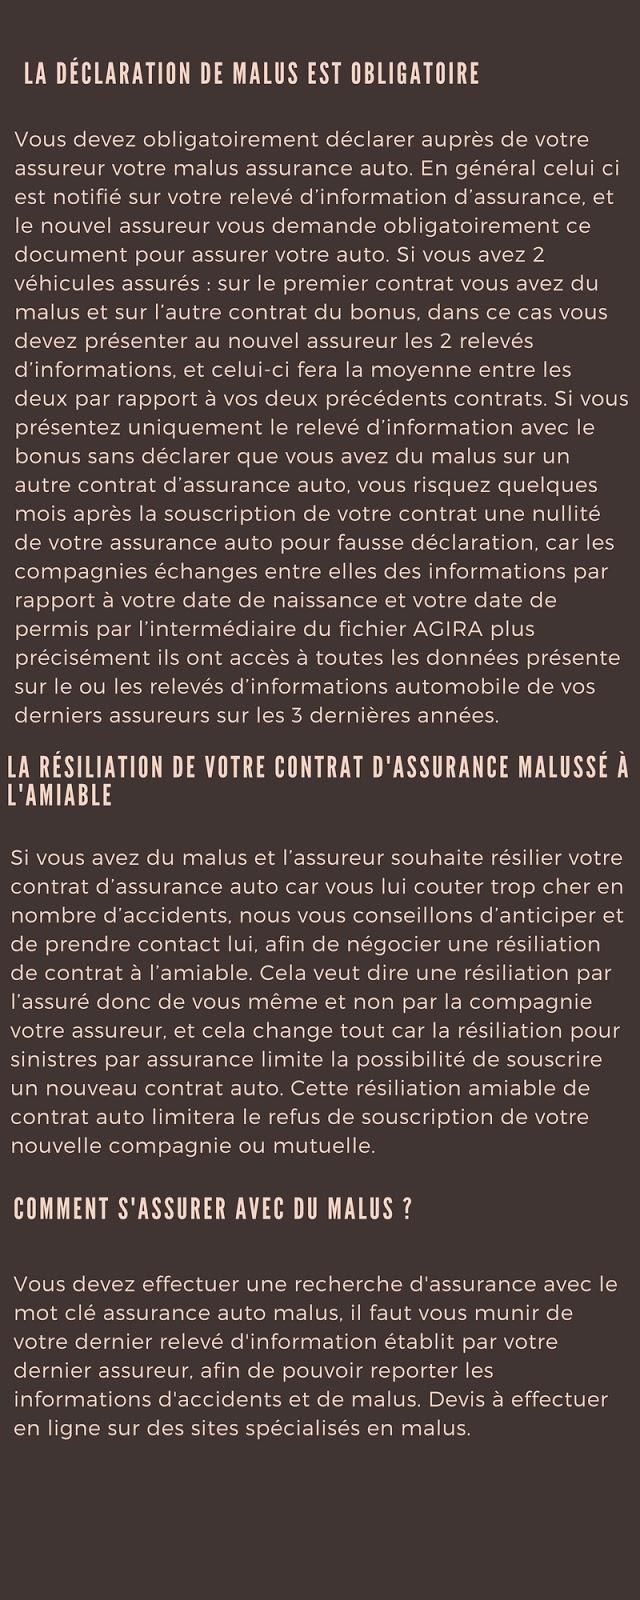 Assurance automobile malus 2